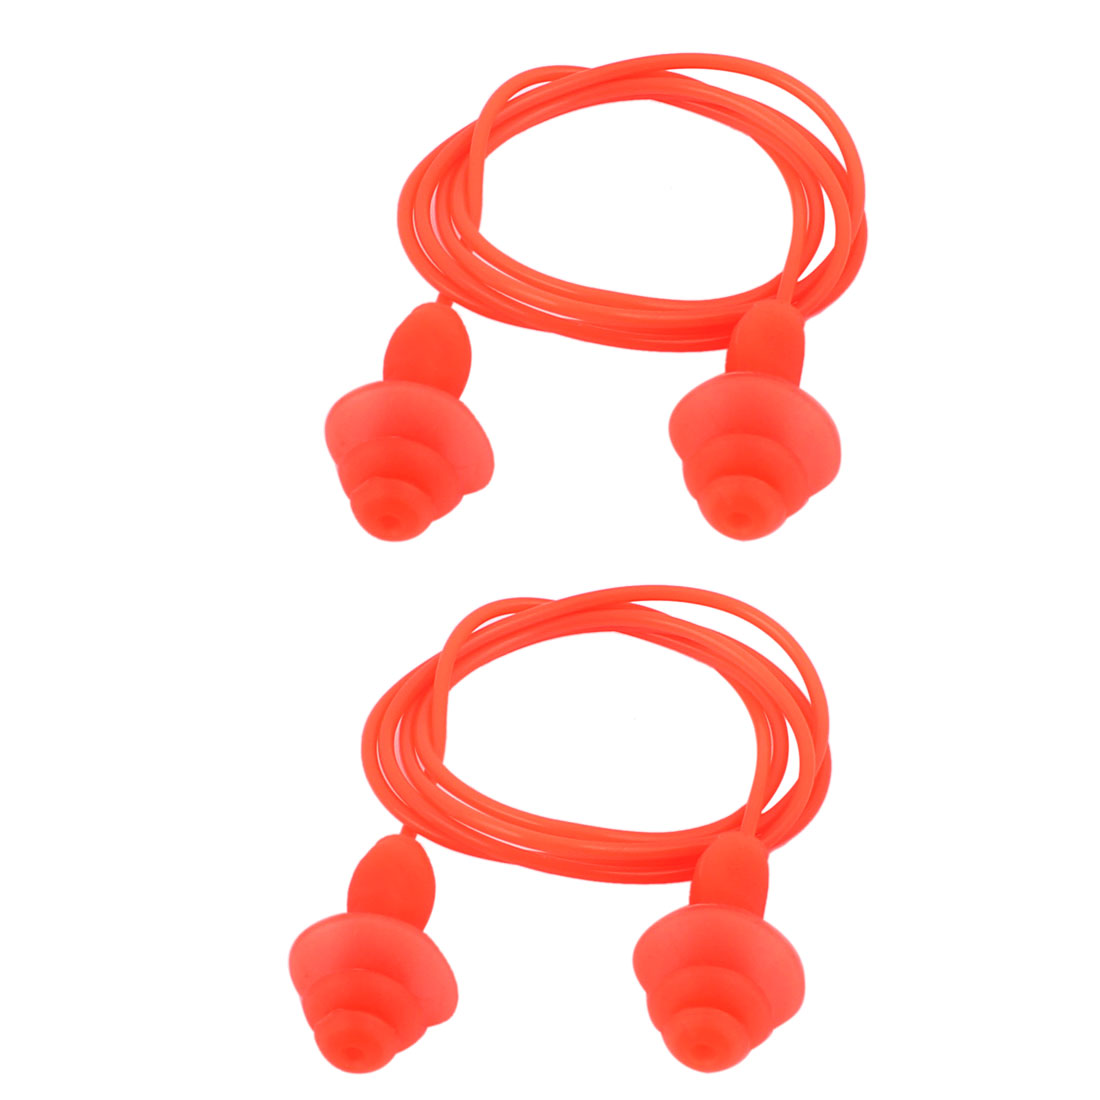 Soft Silicone Swimming String Earplug Ear Plugs Protector Orange 2pcs